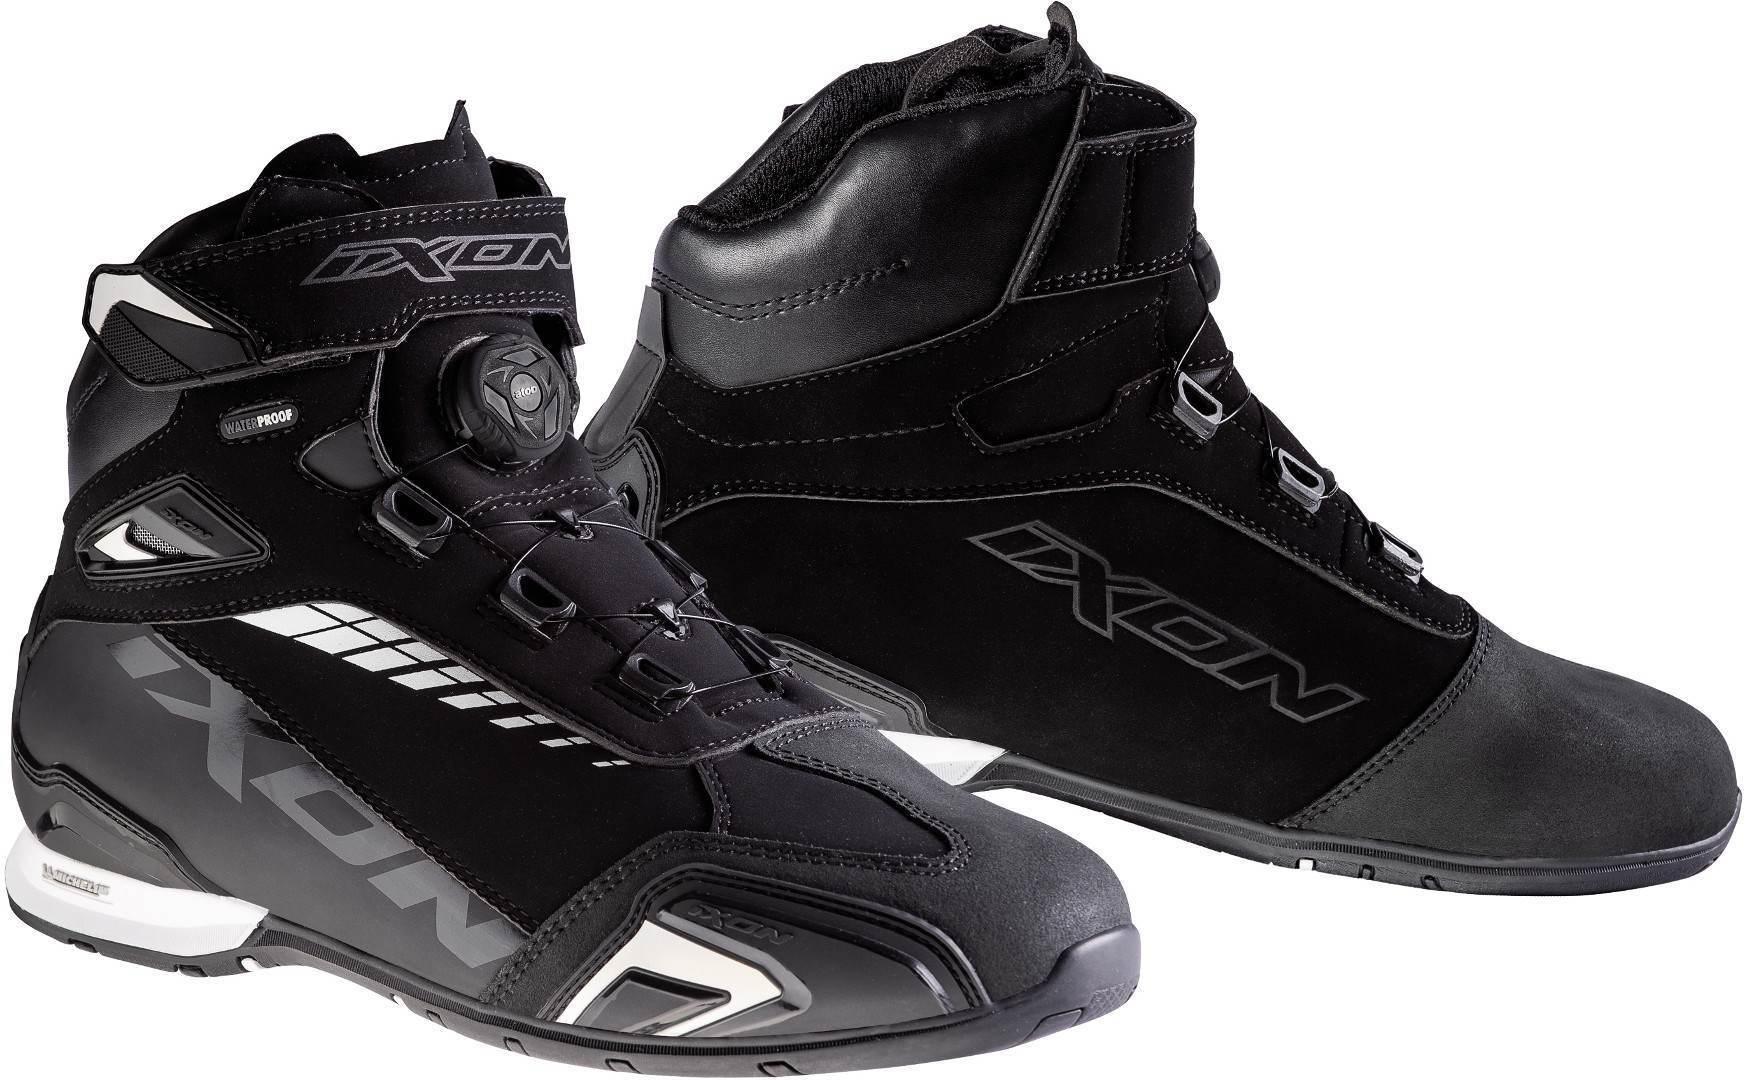 Ixon Bull WP Motorradschuhe, schwarz-weiss, Größe 43, schwarz-weiss, Größe 43